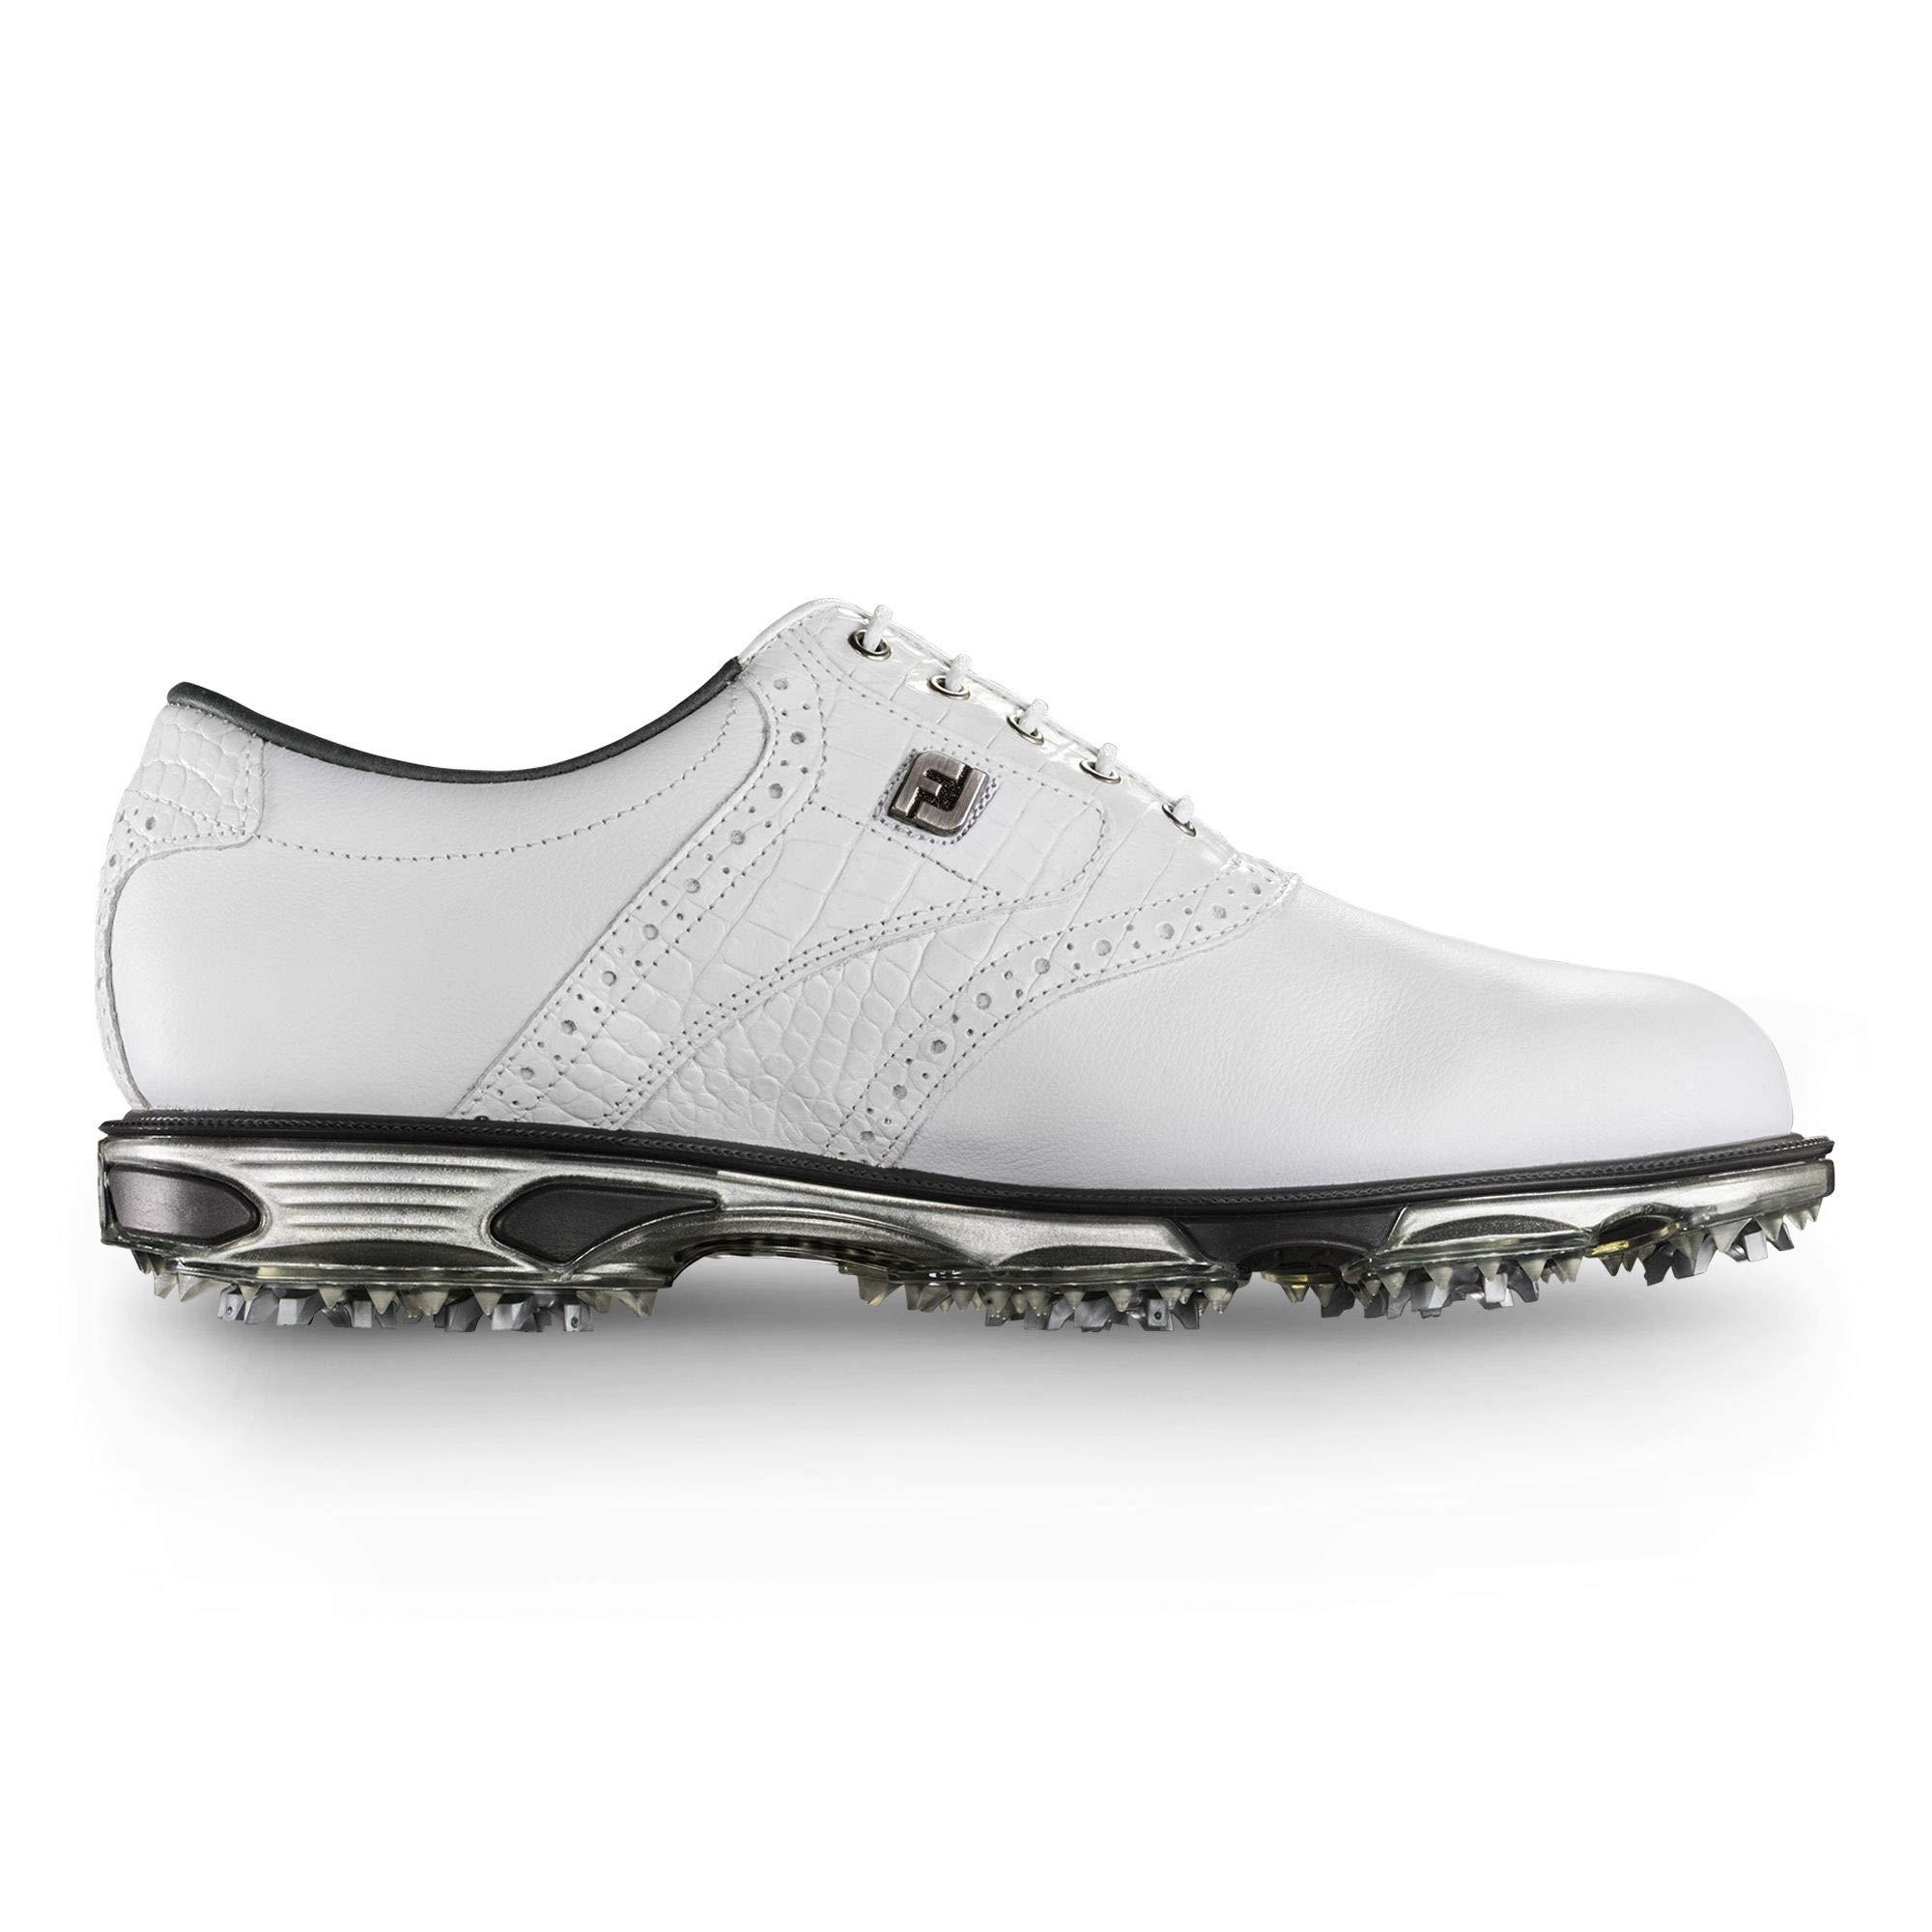 FootJoy Men's DryJoys Tour Golf Shoes, White/White Croc, 11.5 M US by FootJoy